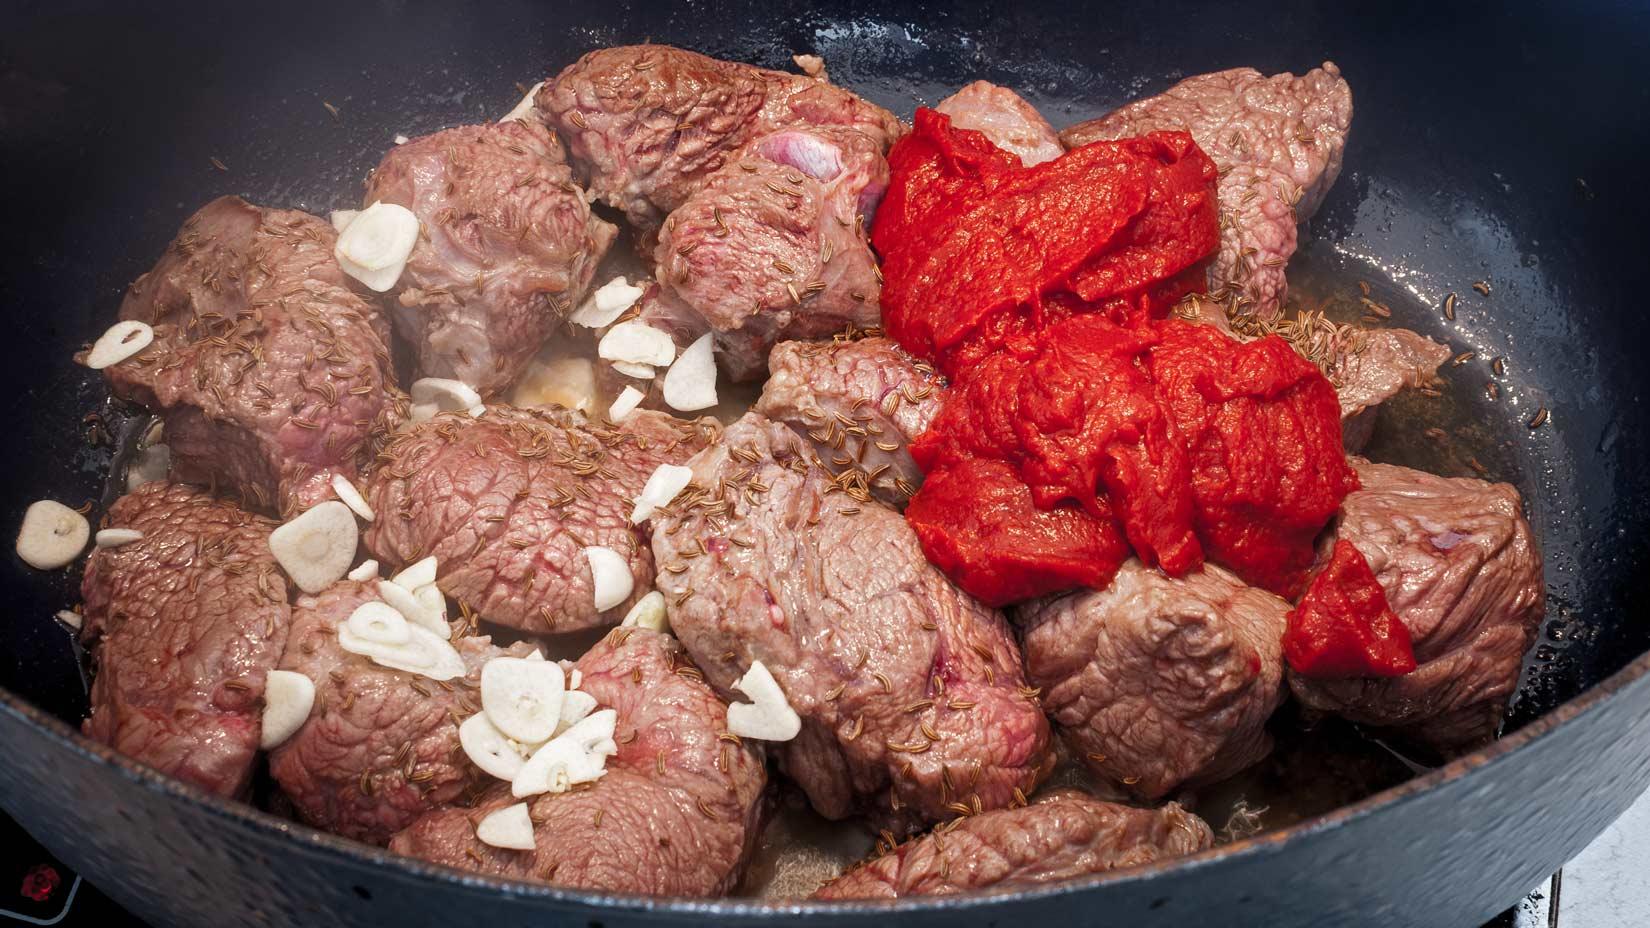 Na orestované maso dáme česnek, kmín, rajský protlak, červené víno a vinný ocet